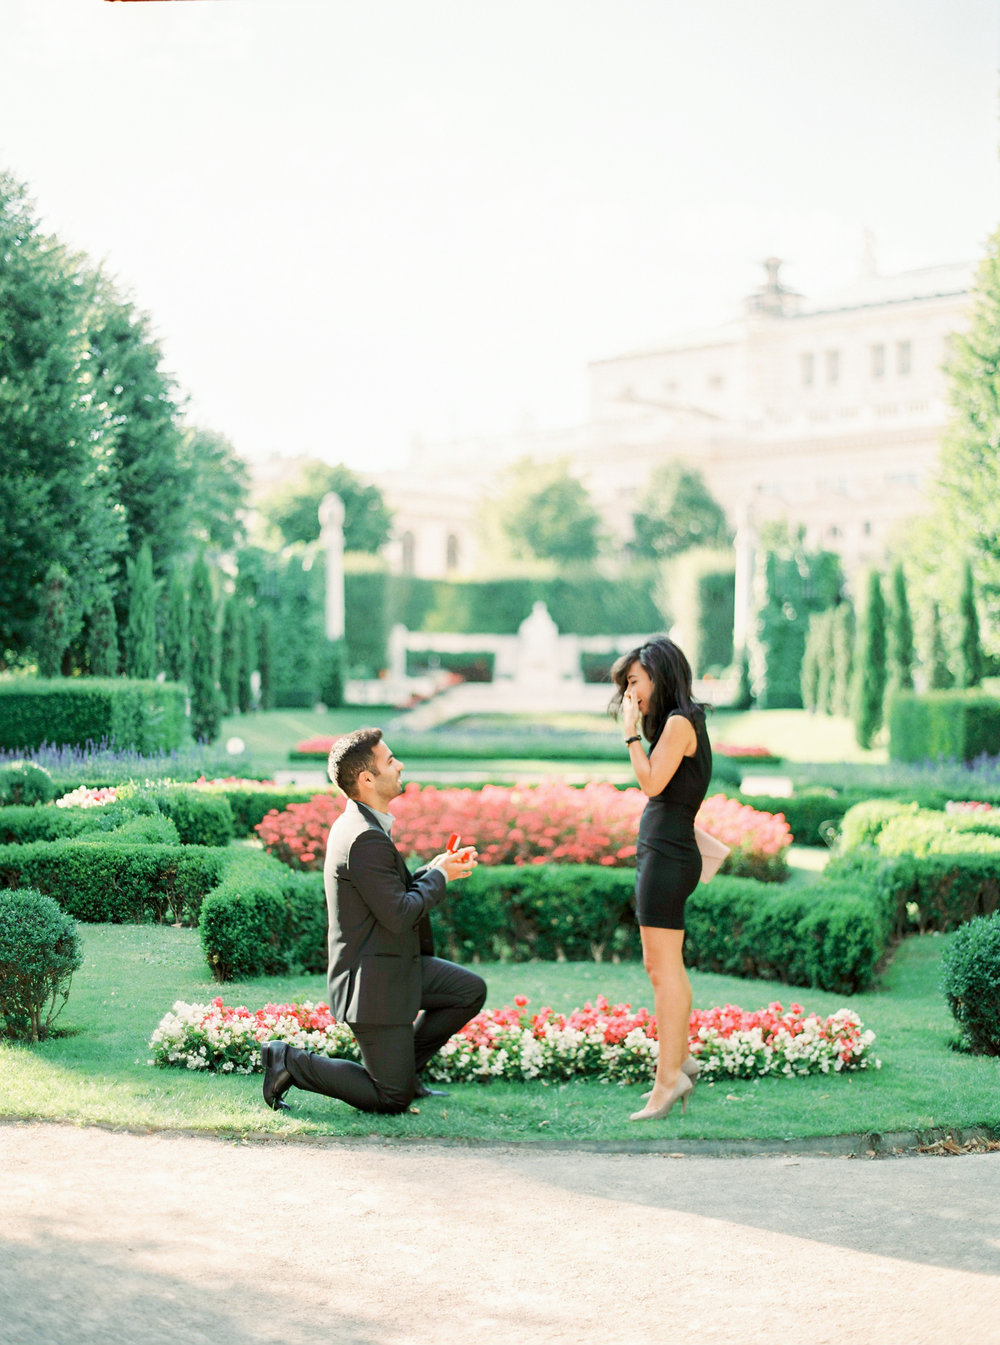 outdoor proposal idea